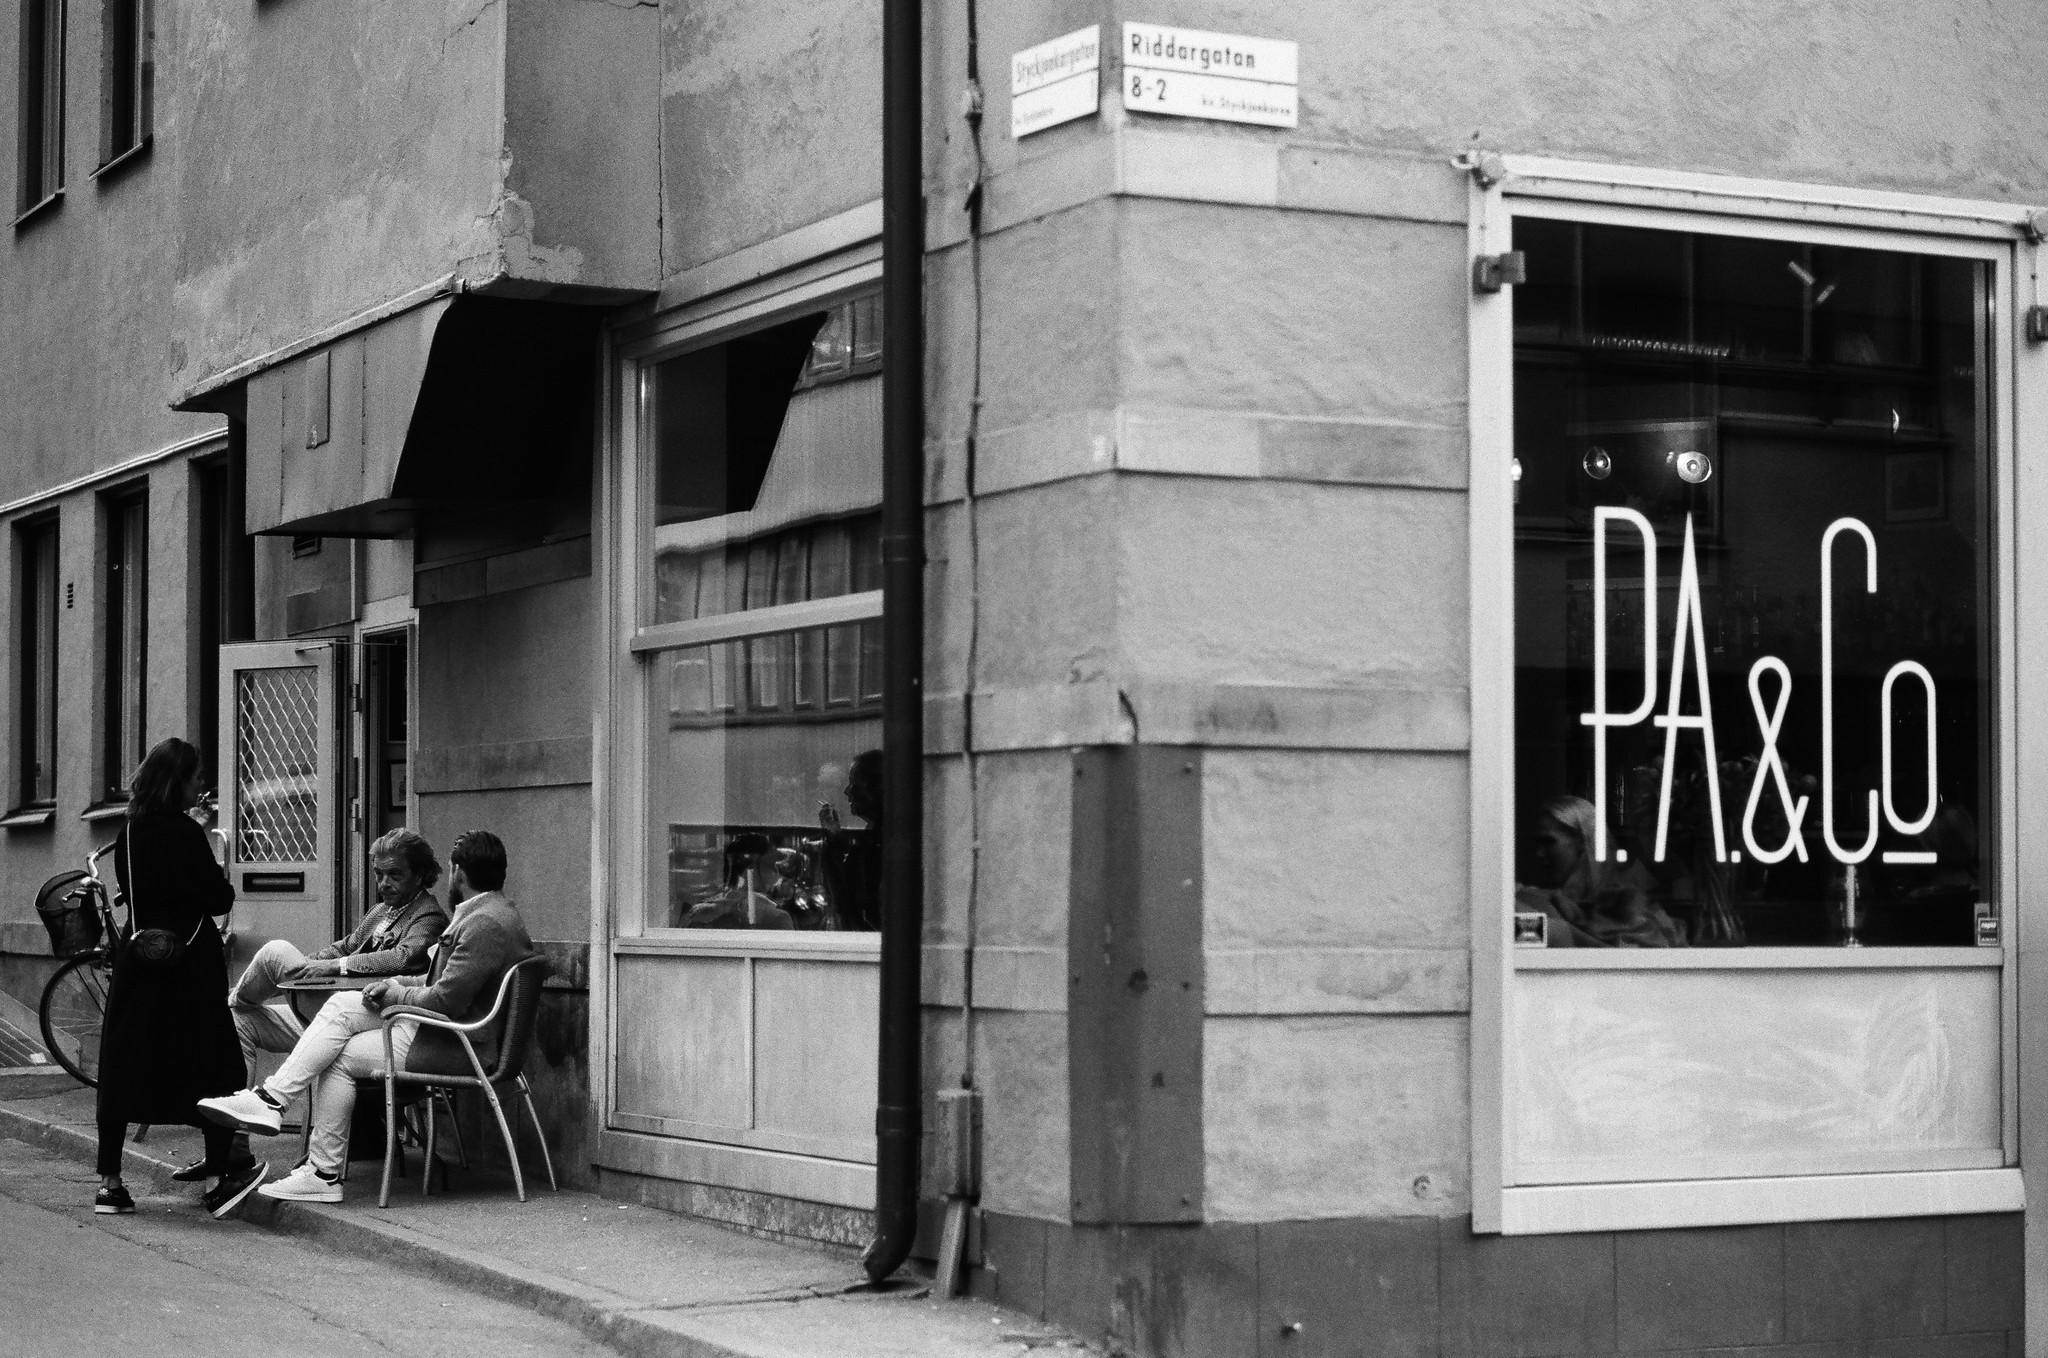 P.A. & Co (Film)